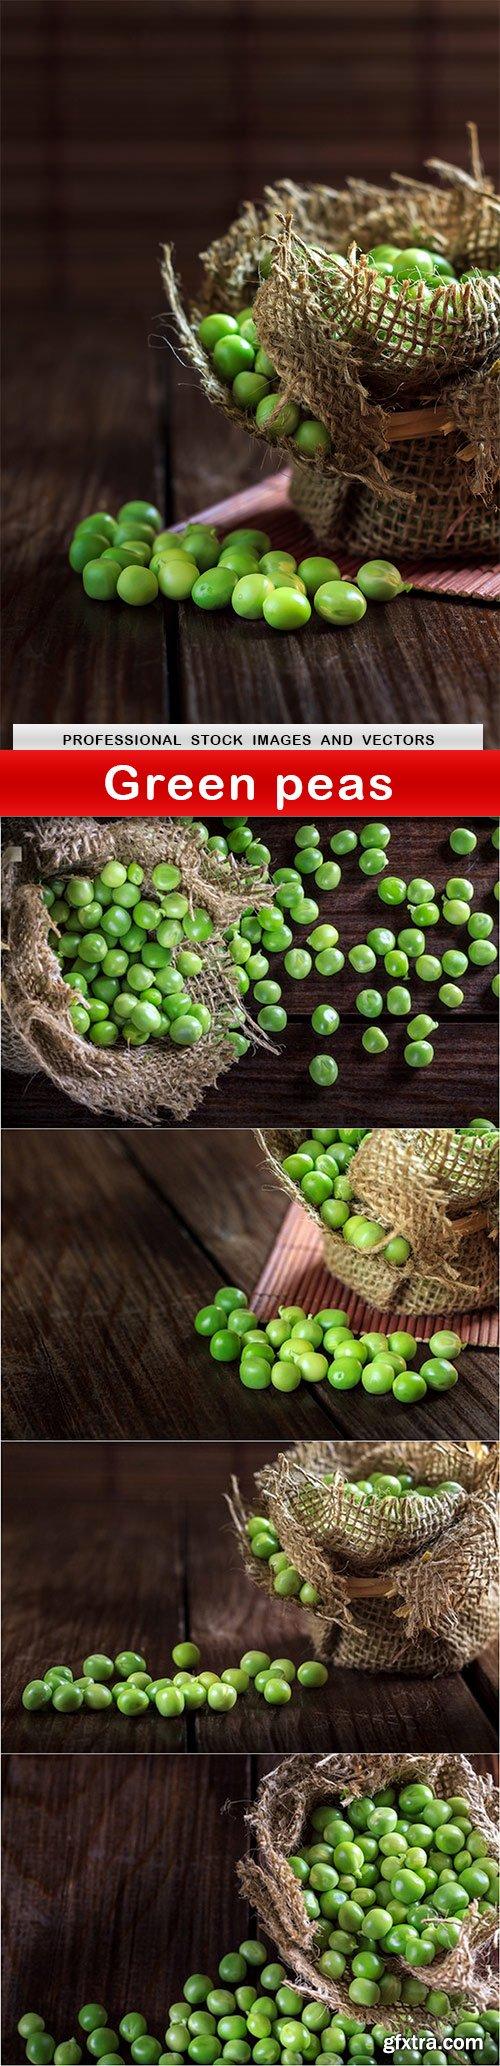 Green peas - 5 UHQ JPEG